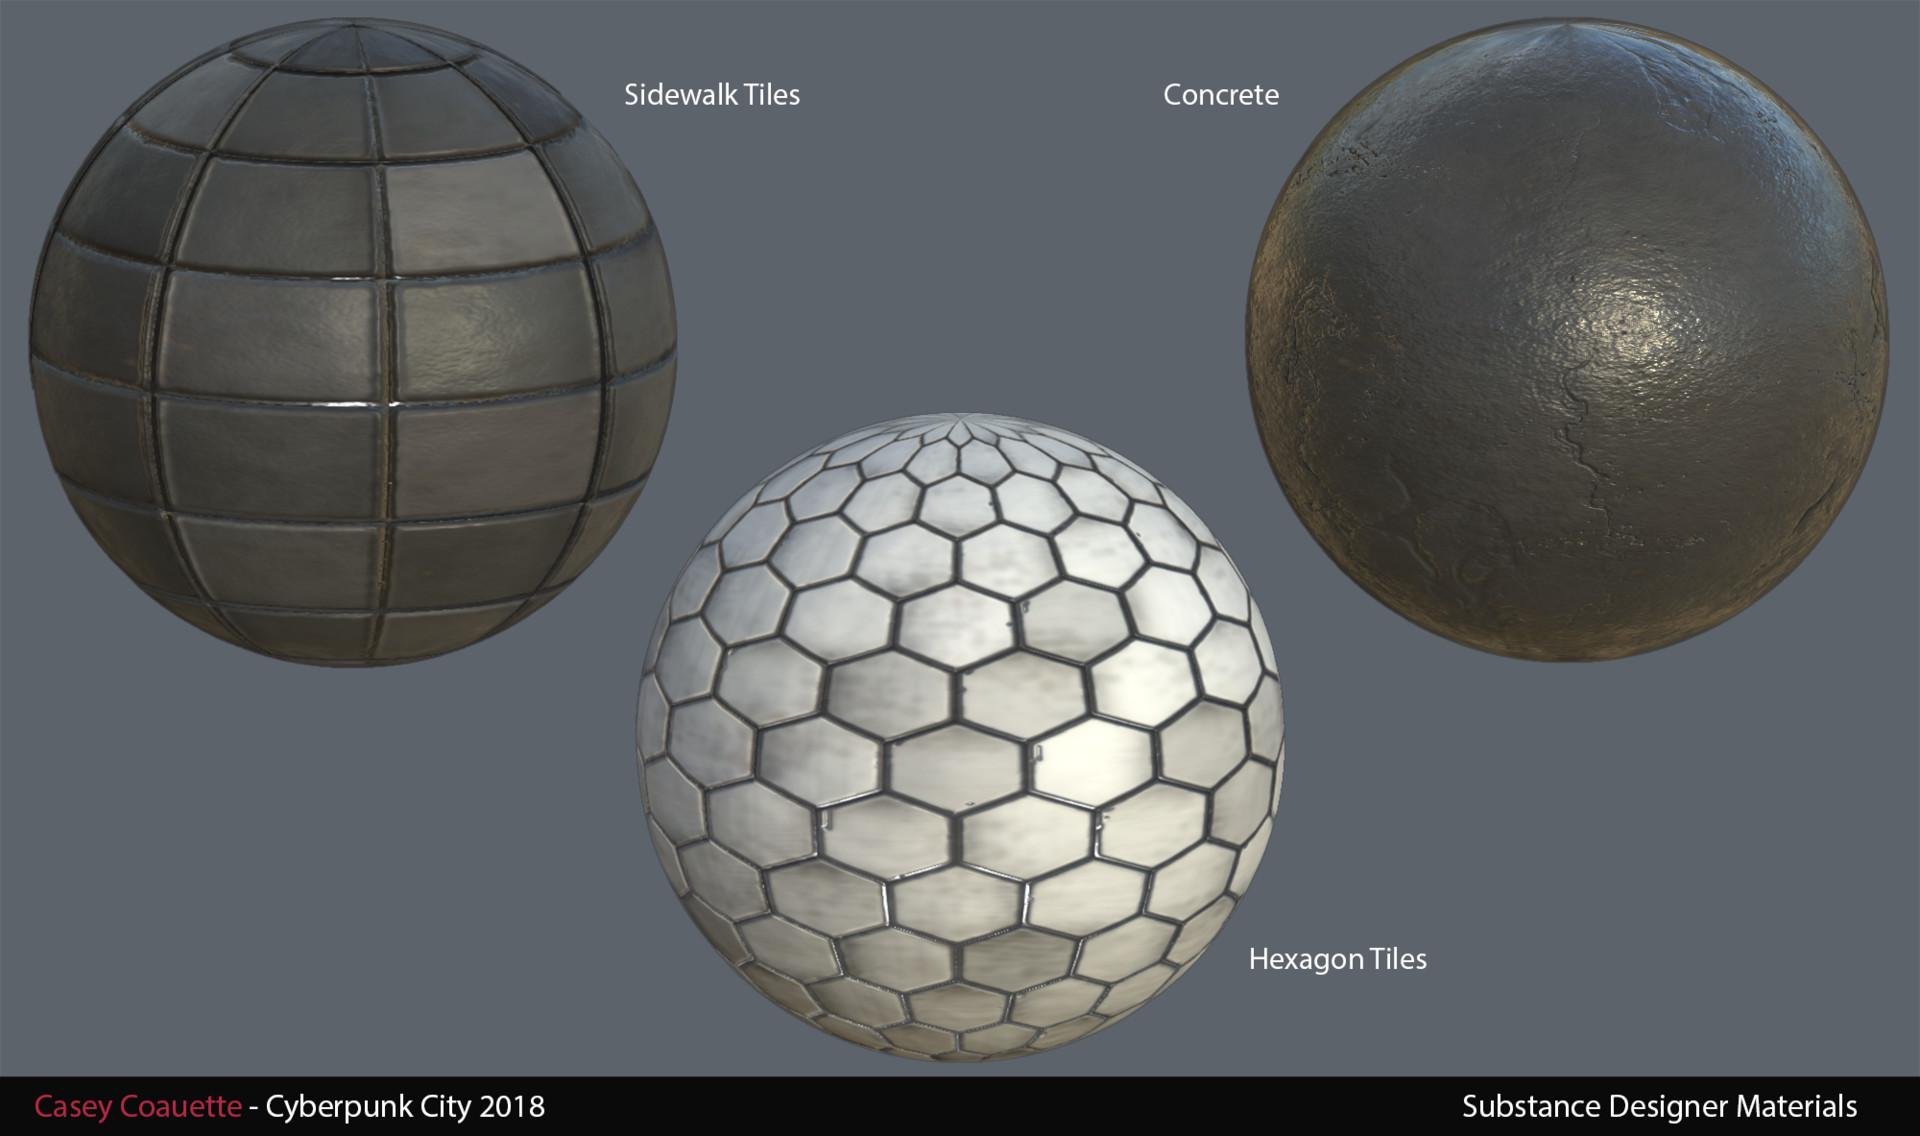 Substance Designer Materials